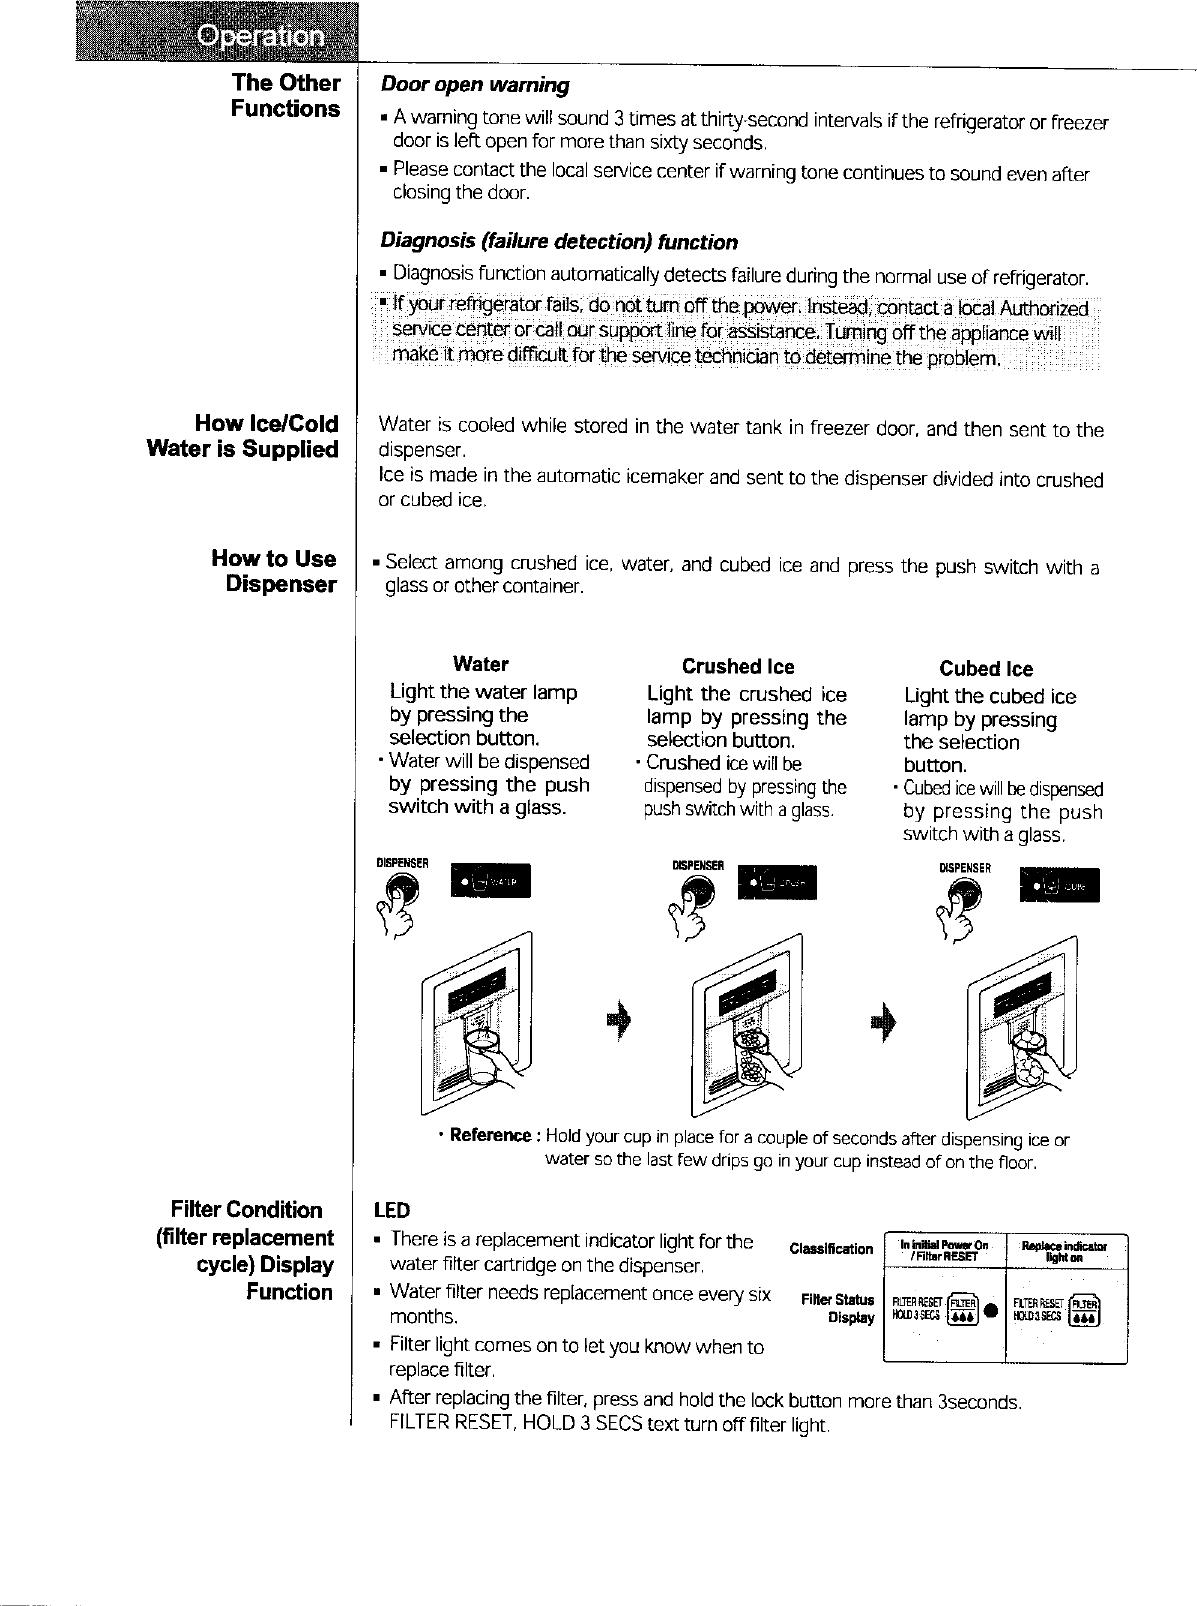 LG LSC26905SB User Manual REFRIGERATOR Manuals And Guides LR708065